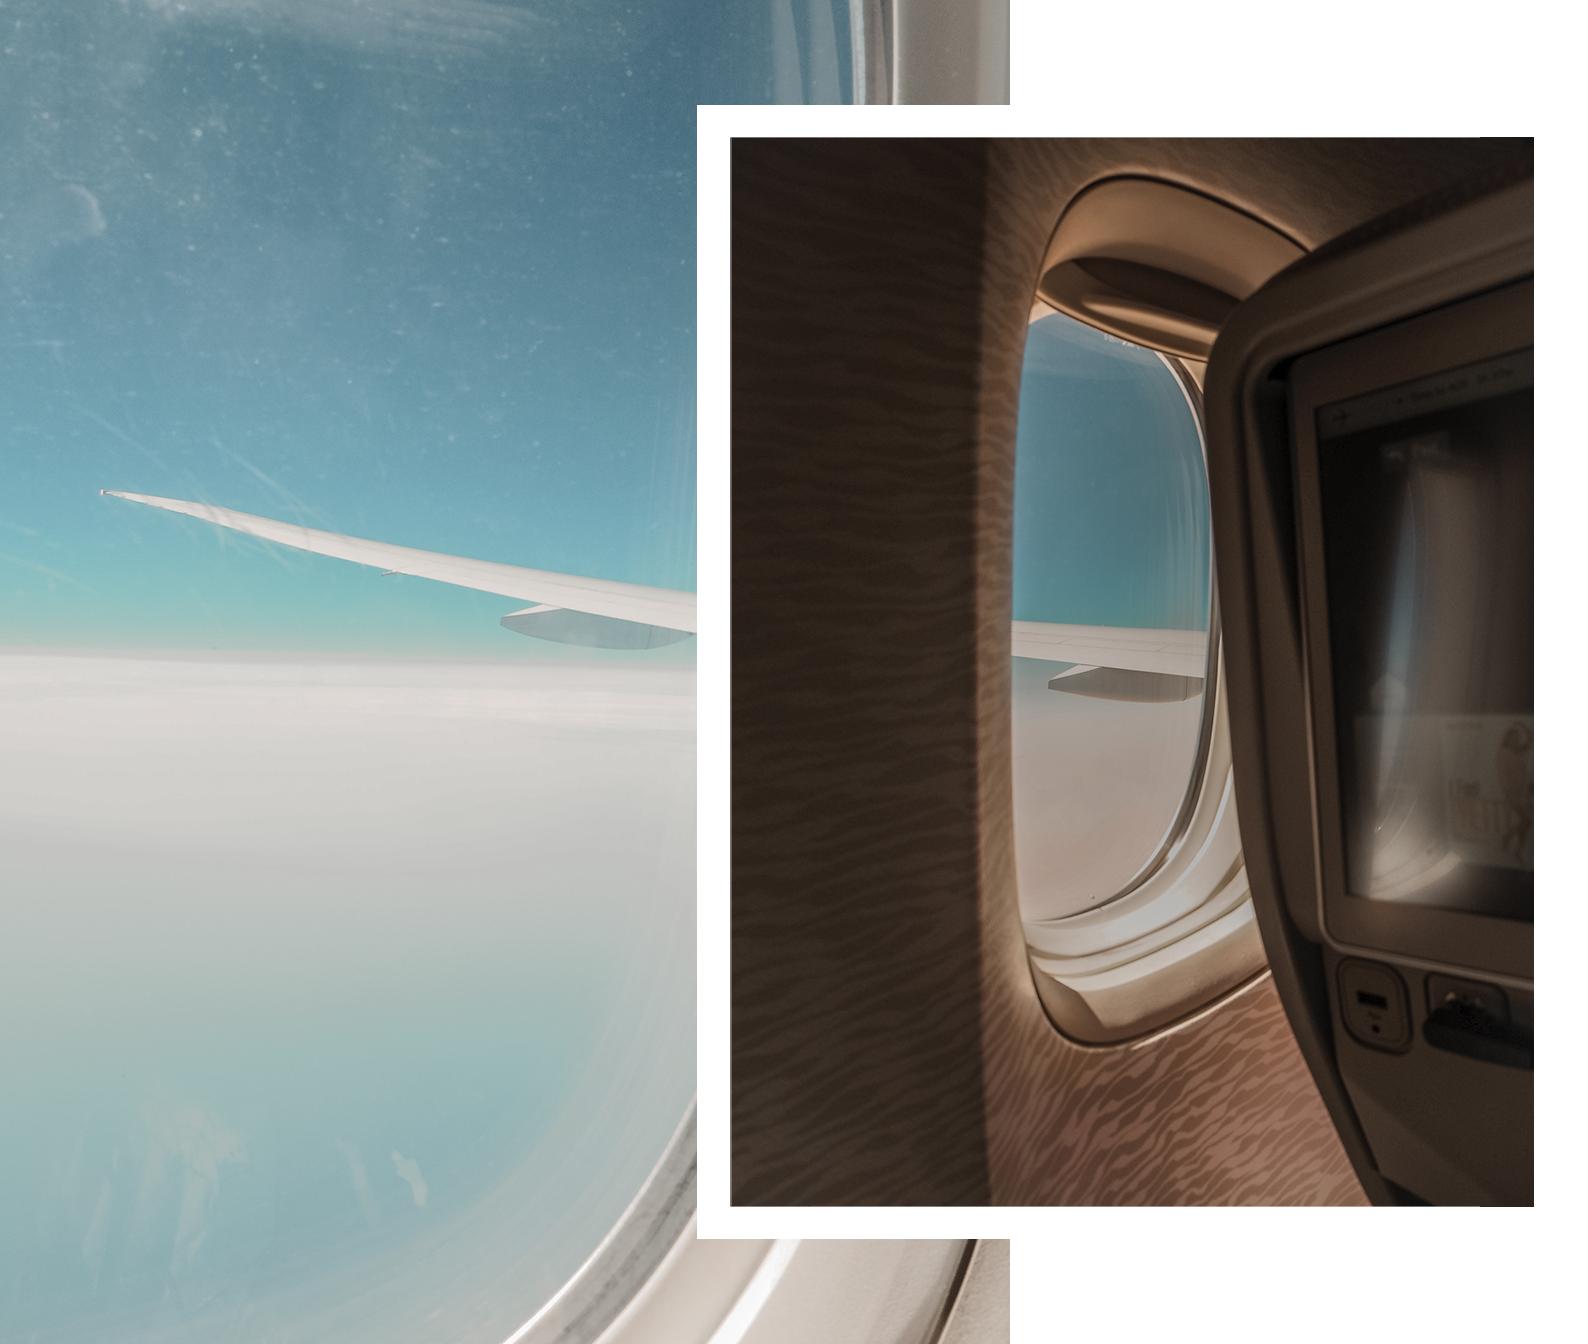 emirates_travel.png